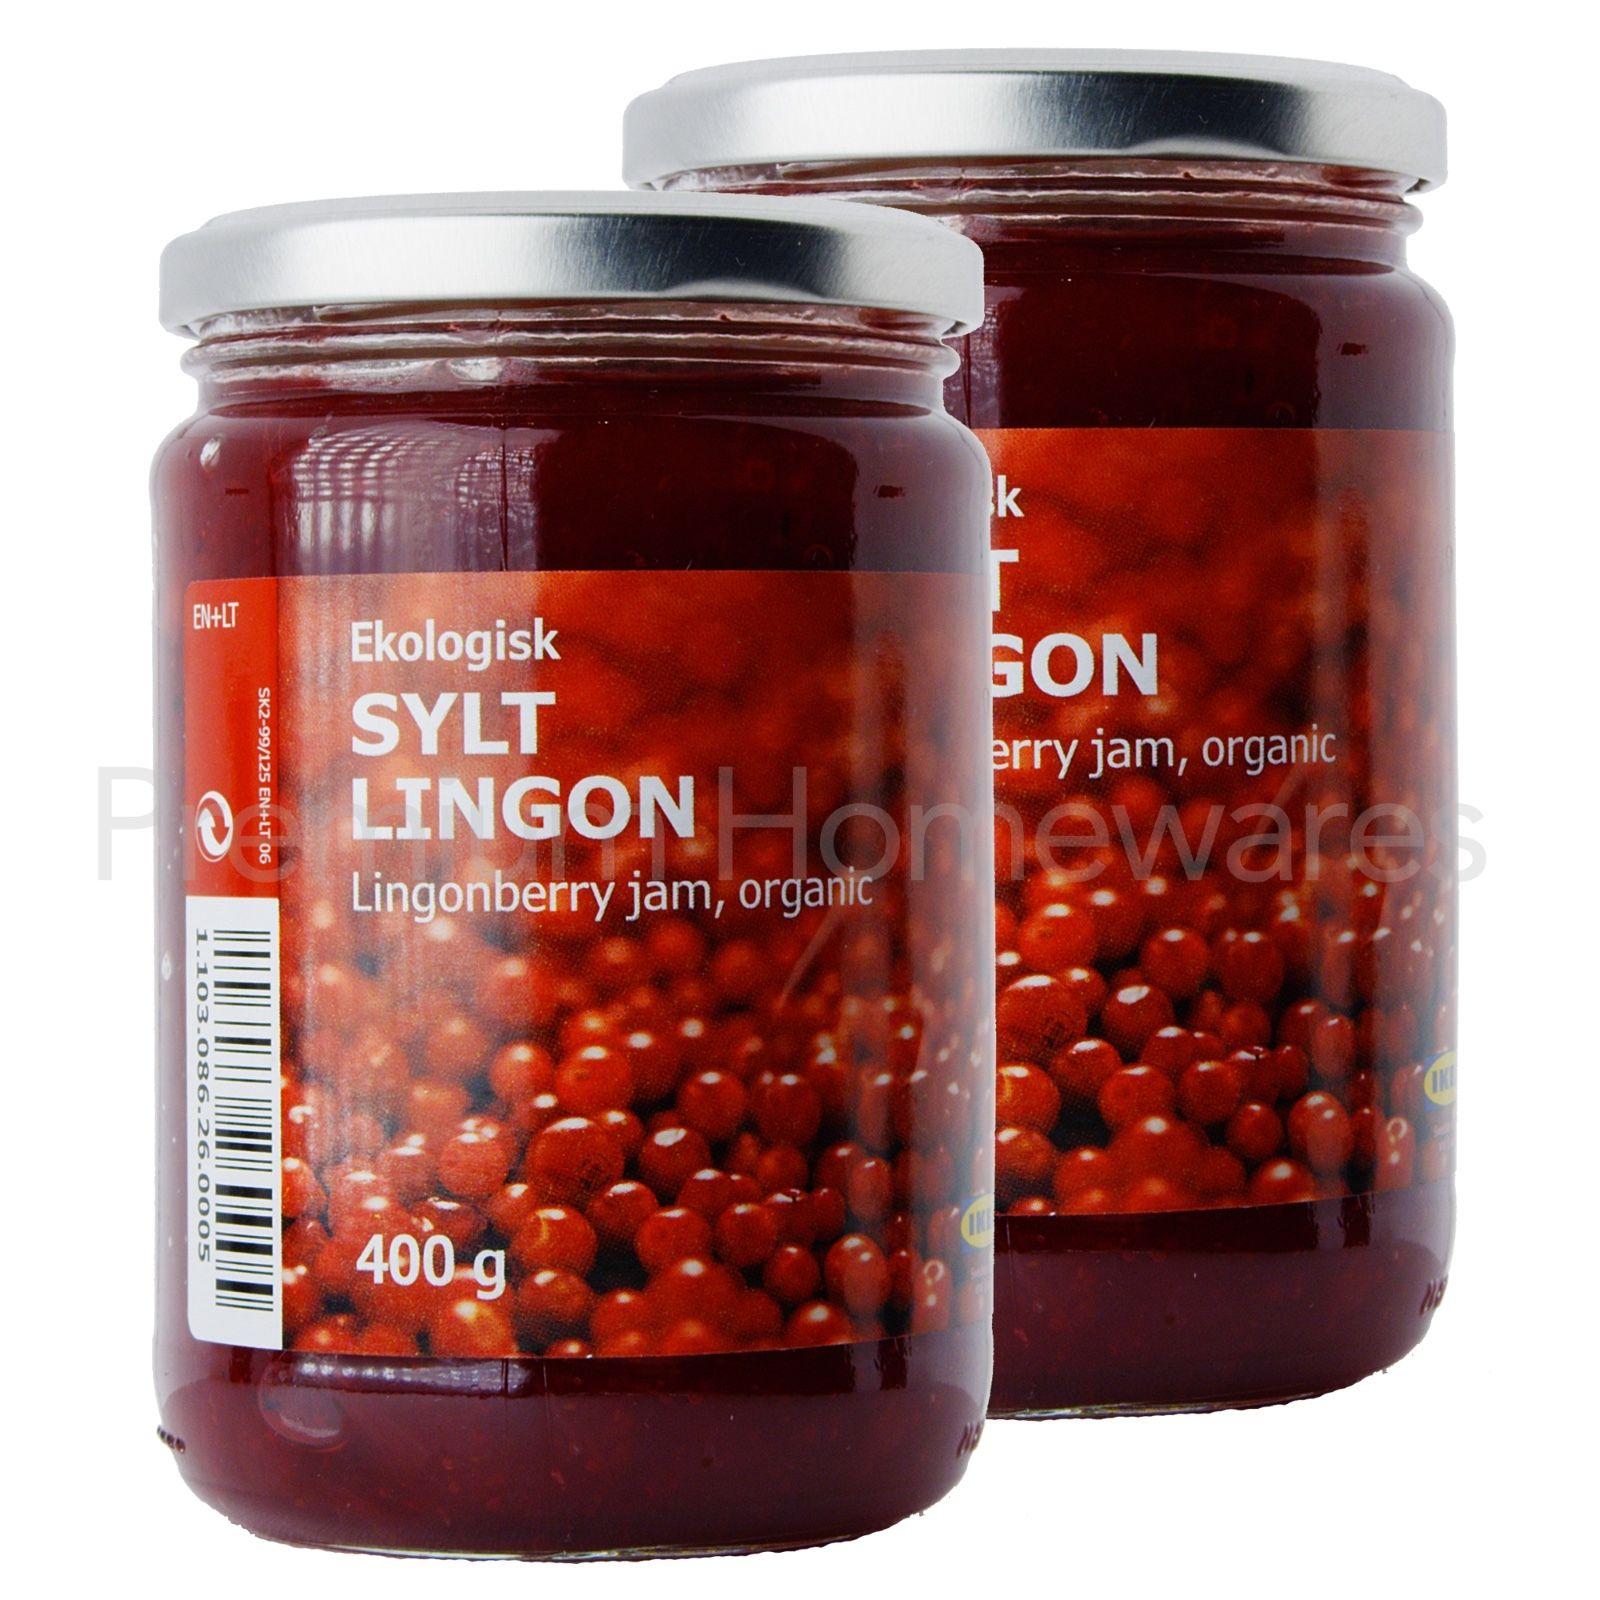 IKEA-lingonberry-jam